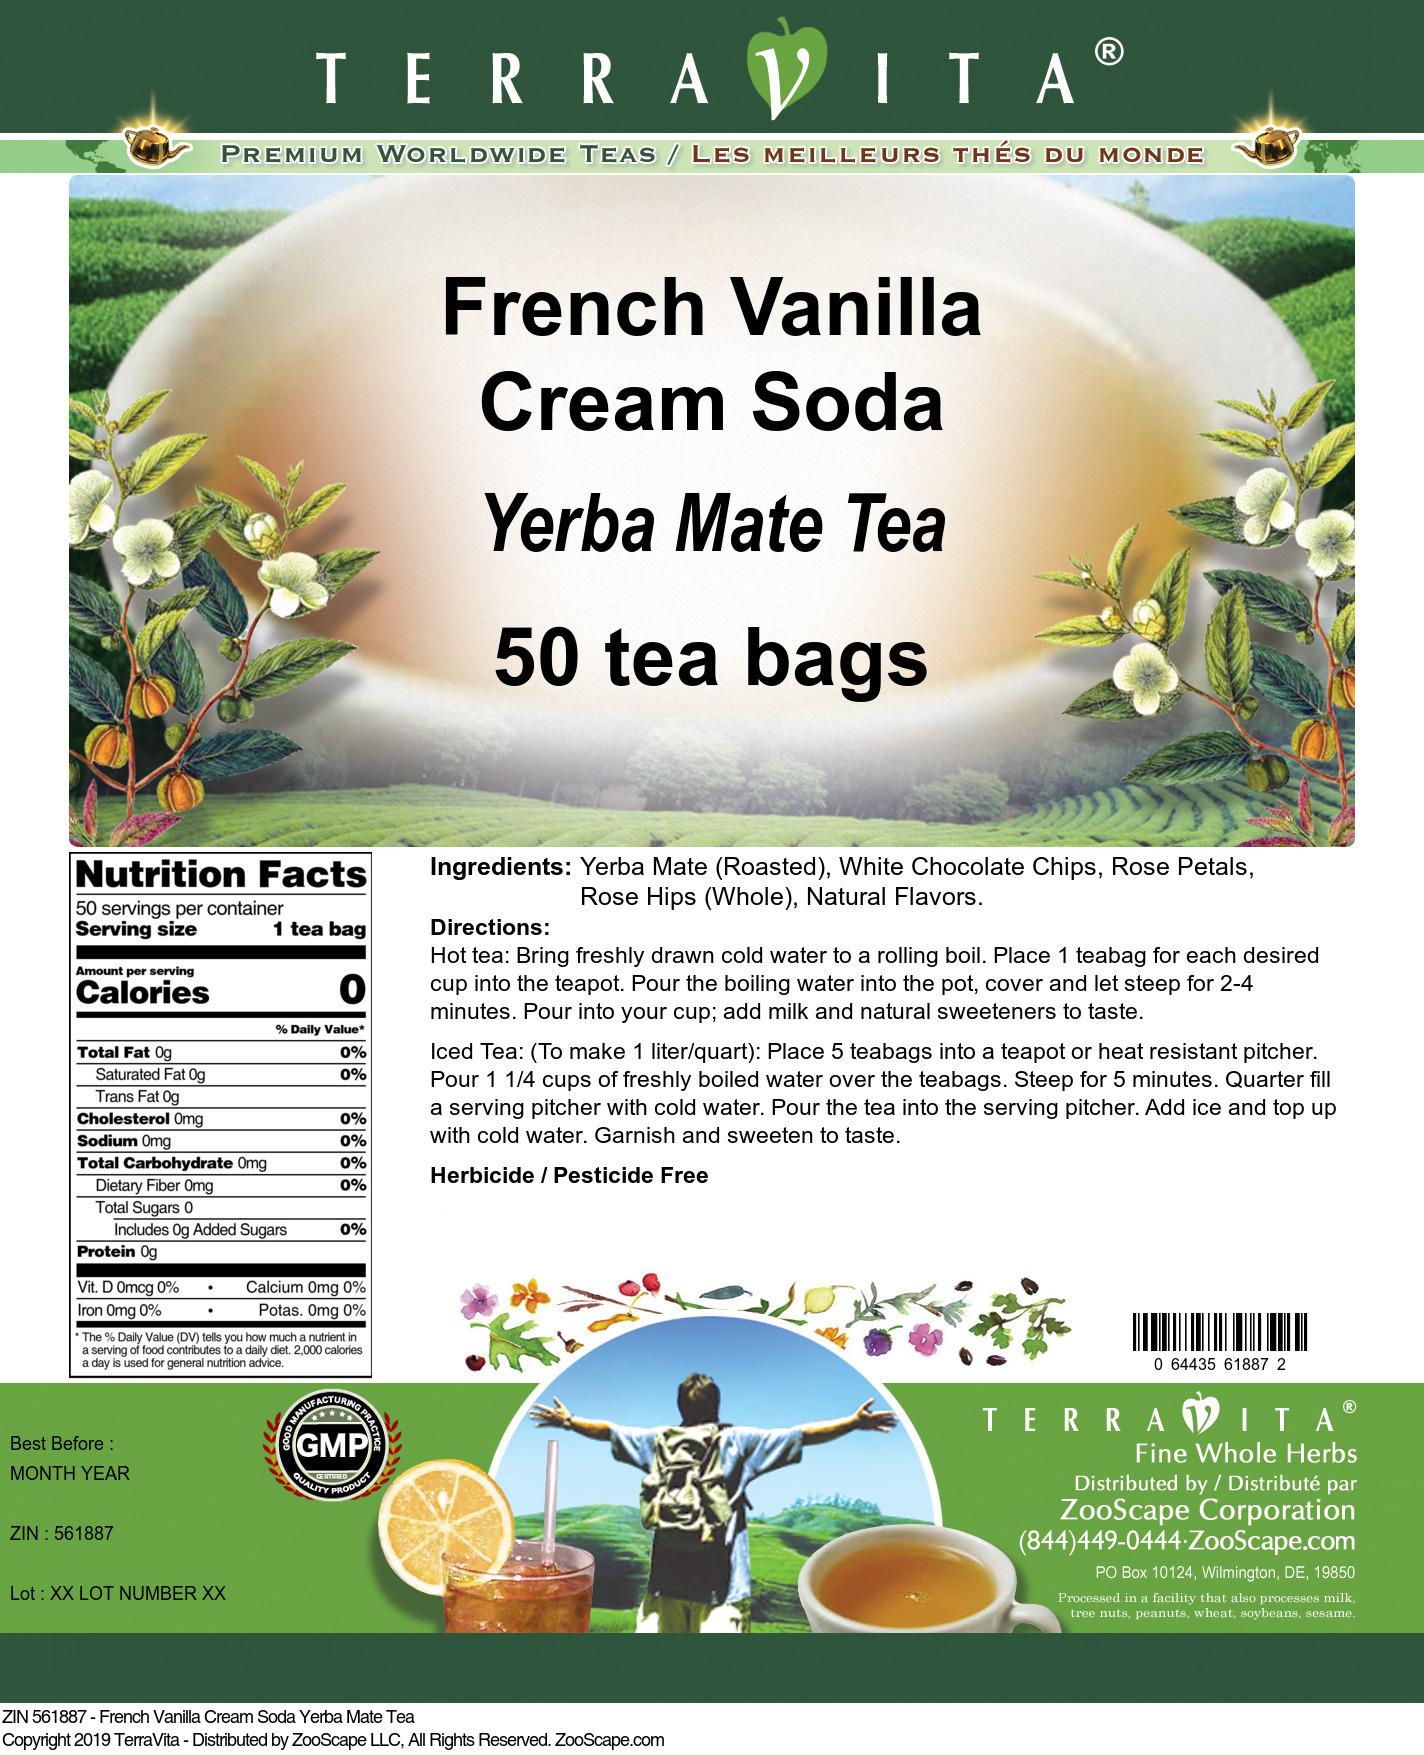 French Vanilla Cream Soda Yerba Mate Tea